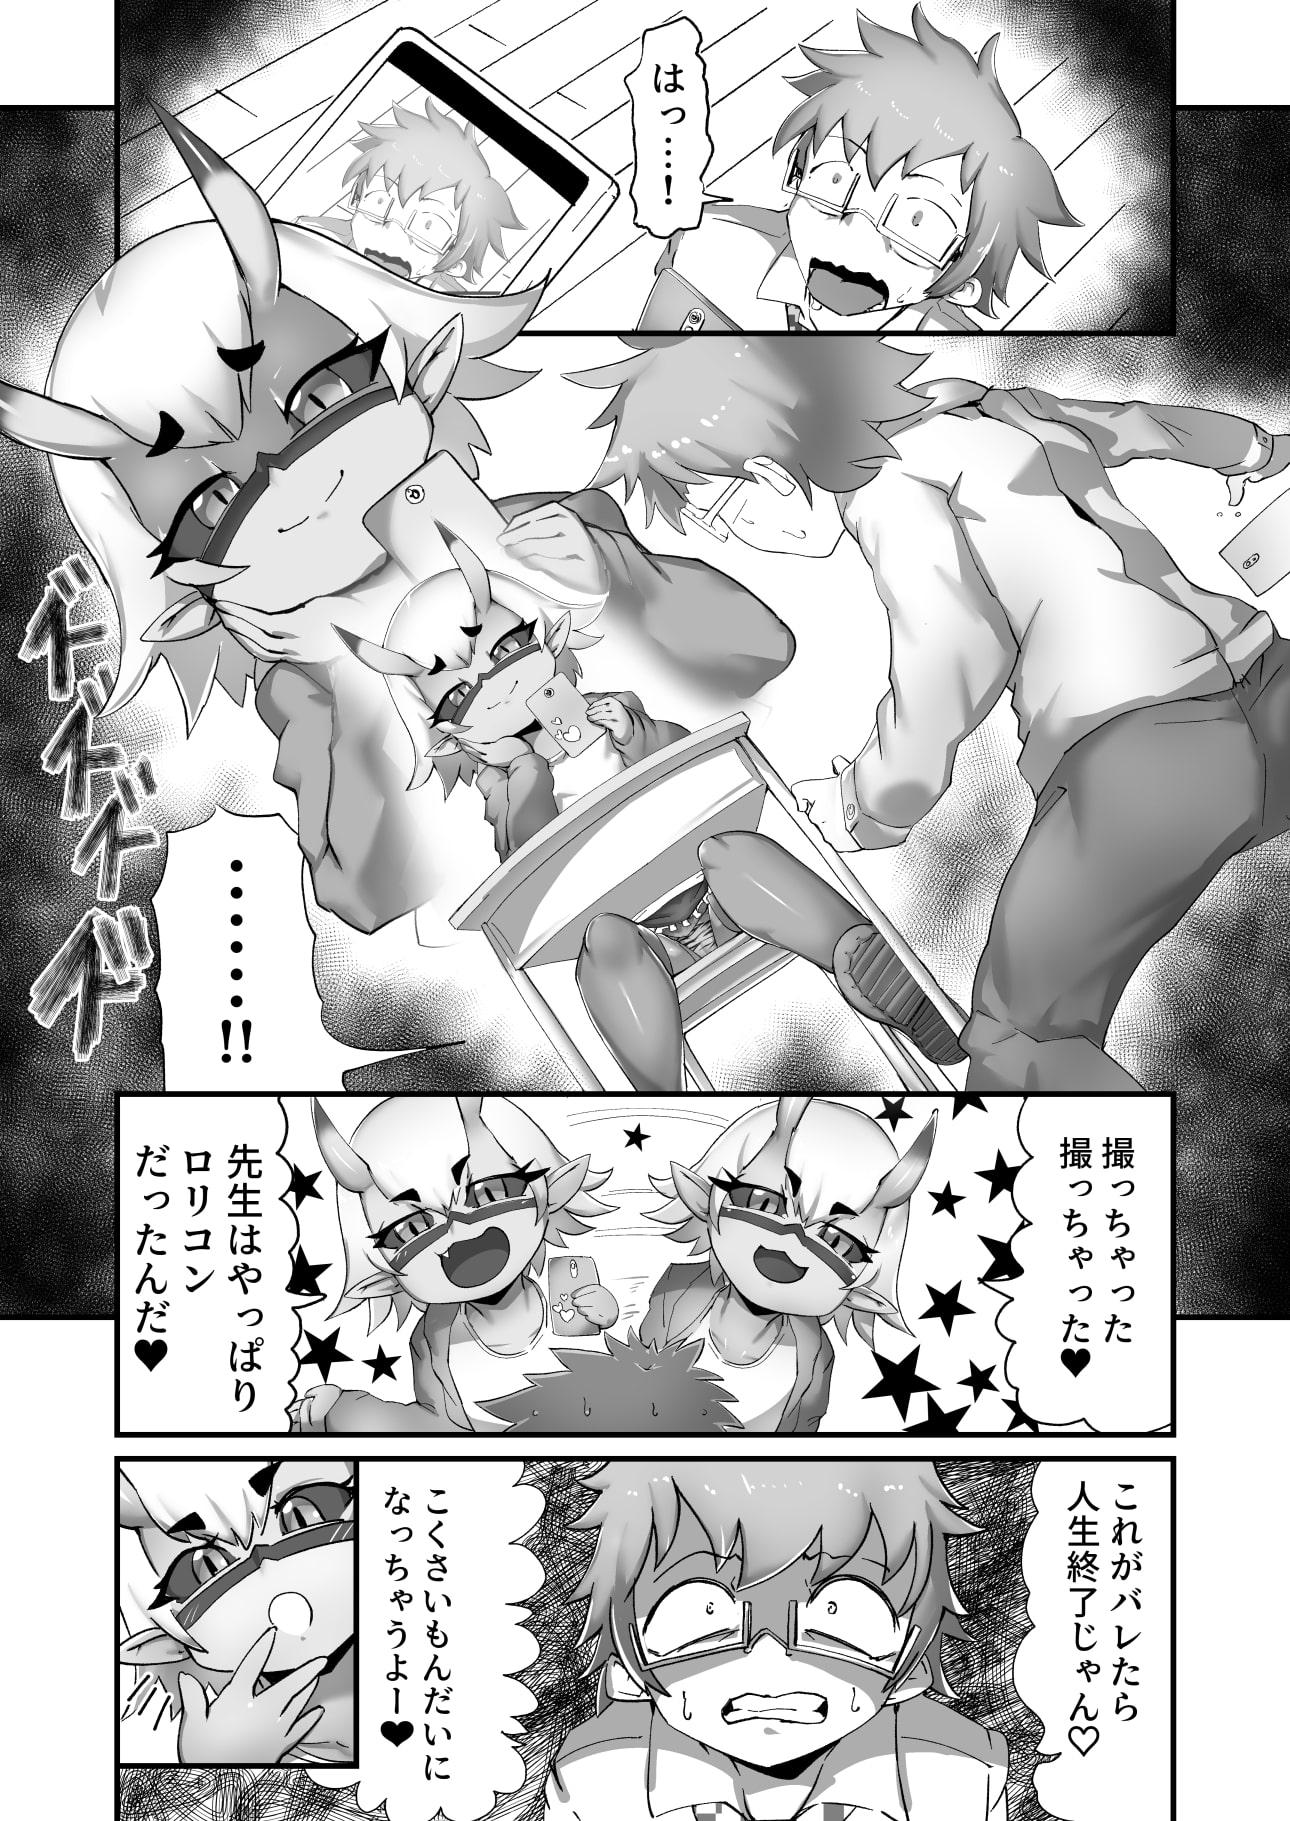 RJ314021 メスガ鬼ちゃんと童貞先生 [20210116]